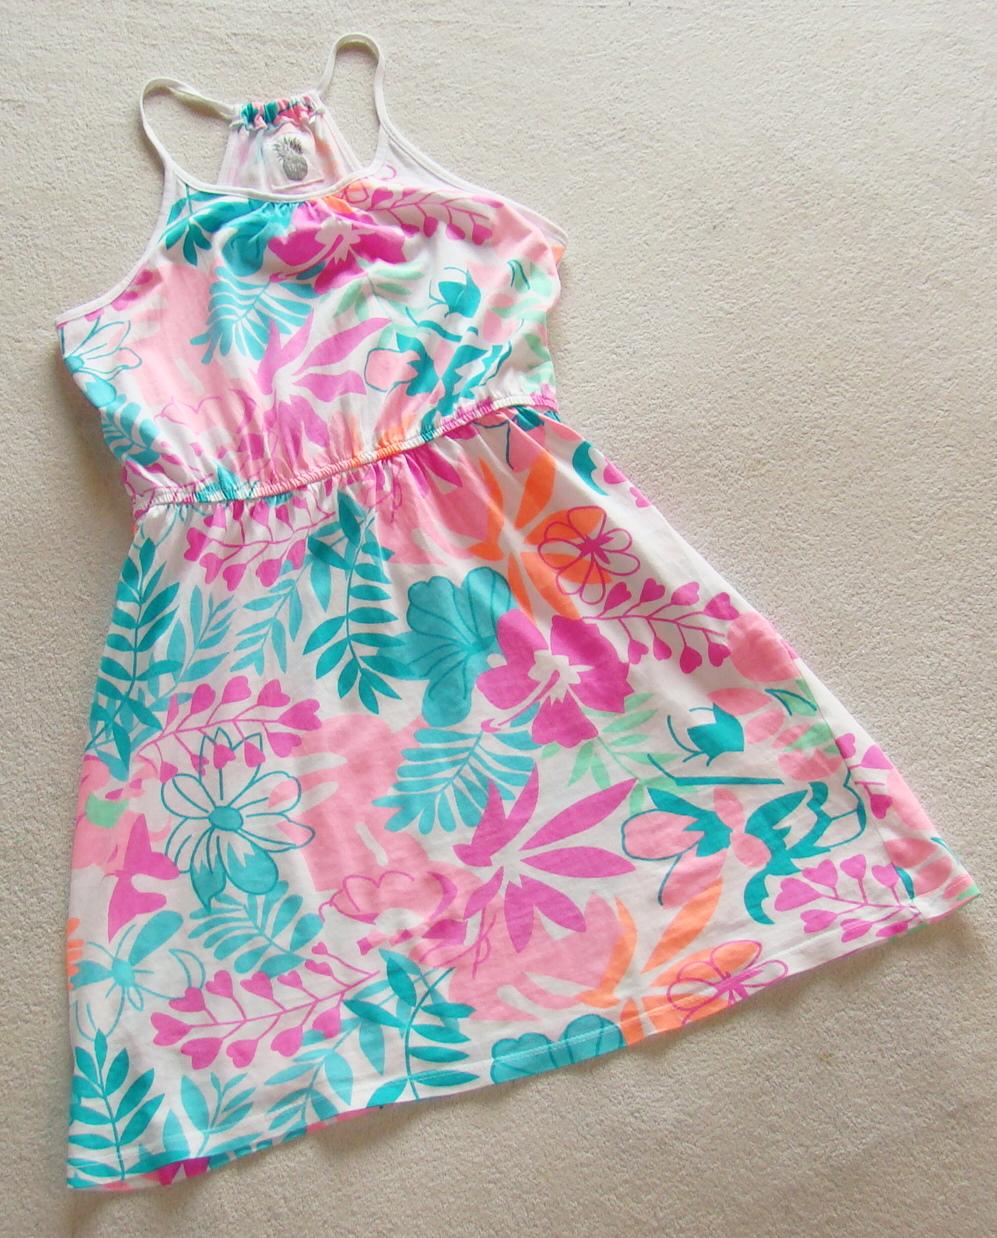 91a3af7ecc Śliczna sukienka 140 cm 9-10 lat COOLC CLUB LATO - 7365487624 ...